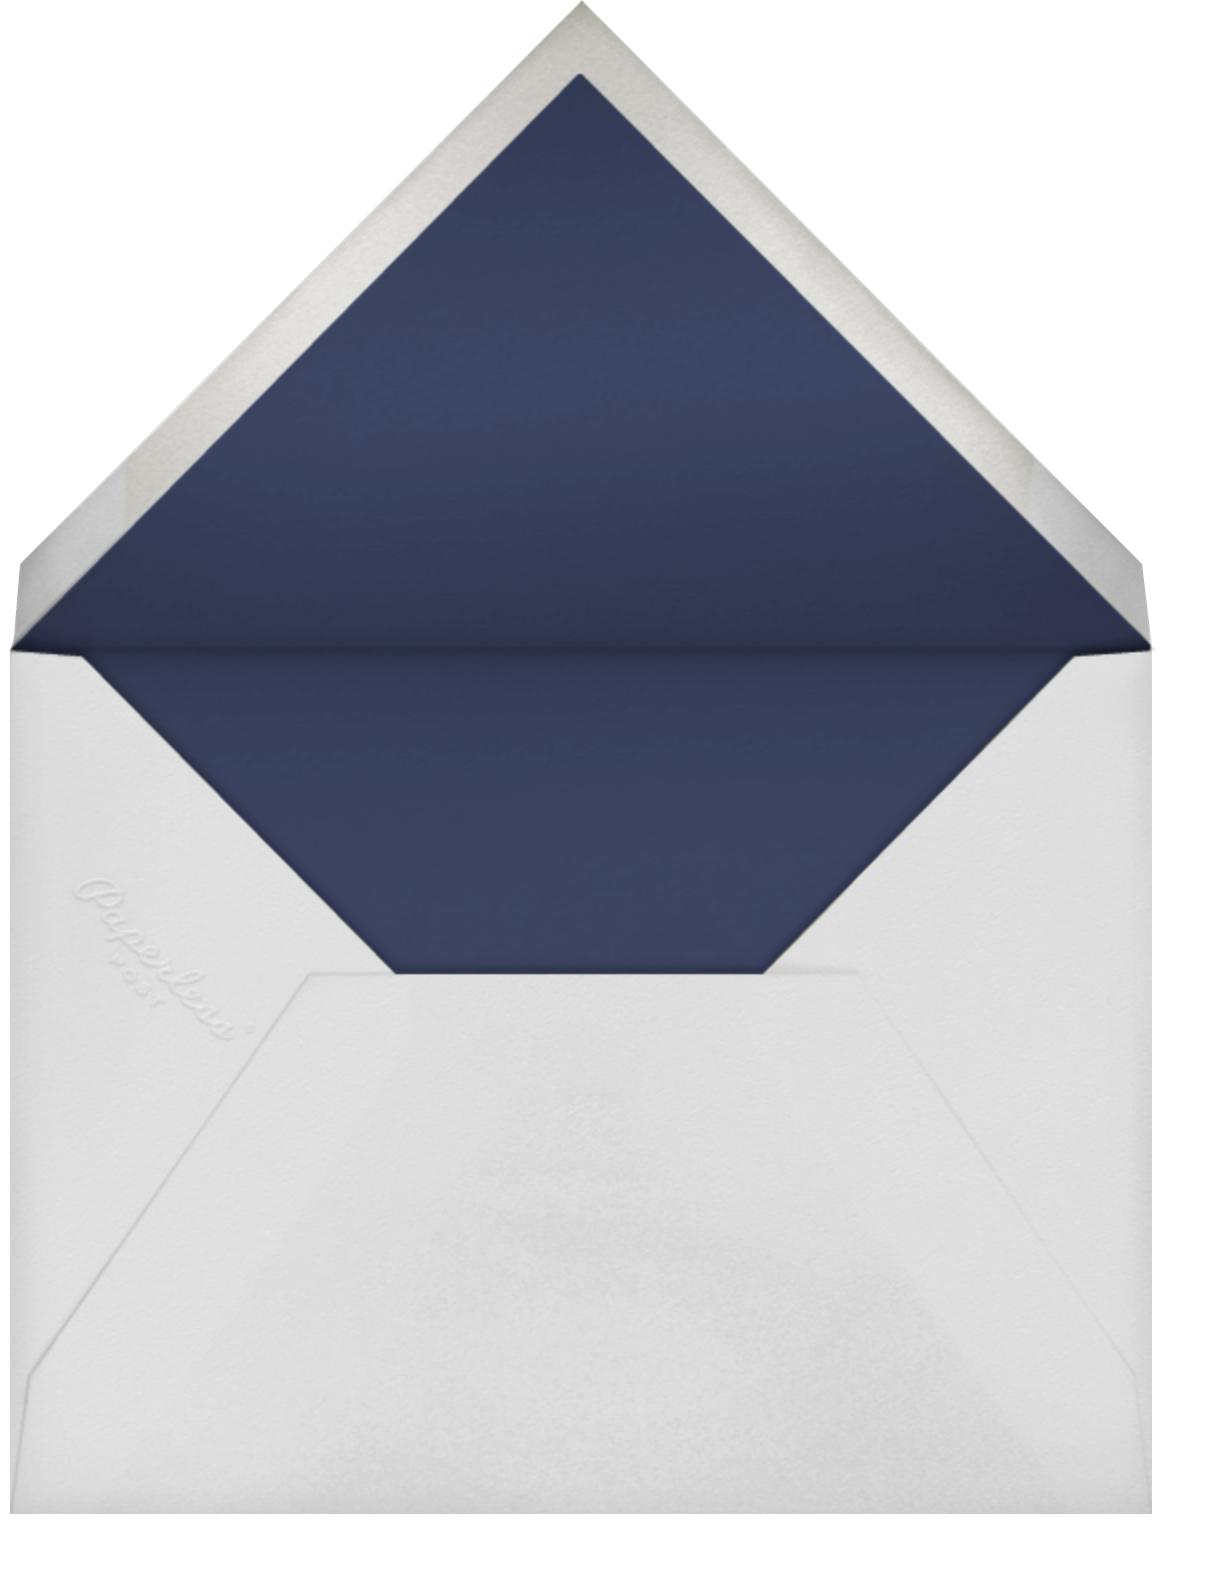 Perfect Spots - Navy - kate spade new york - Adult birthday - envelope back